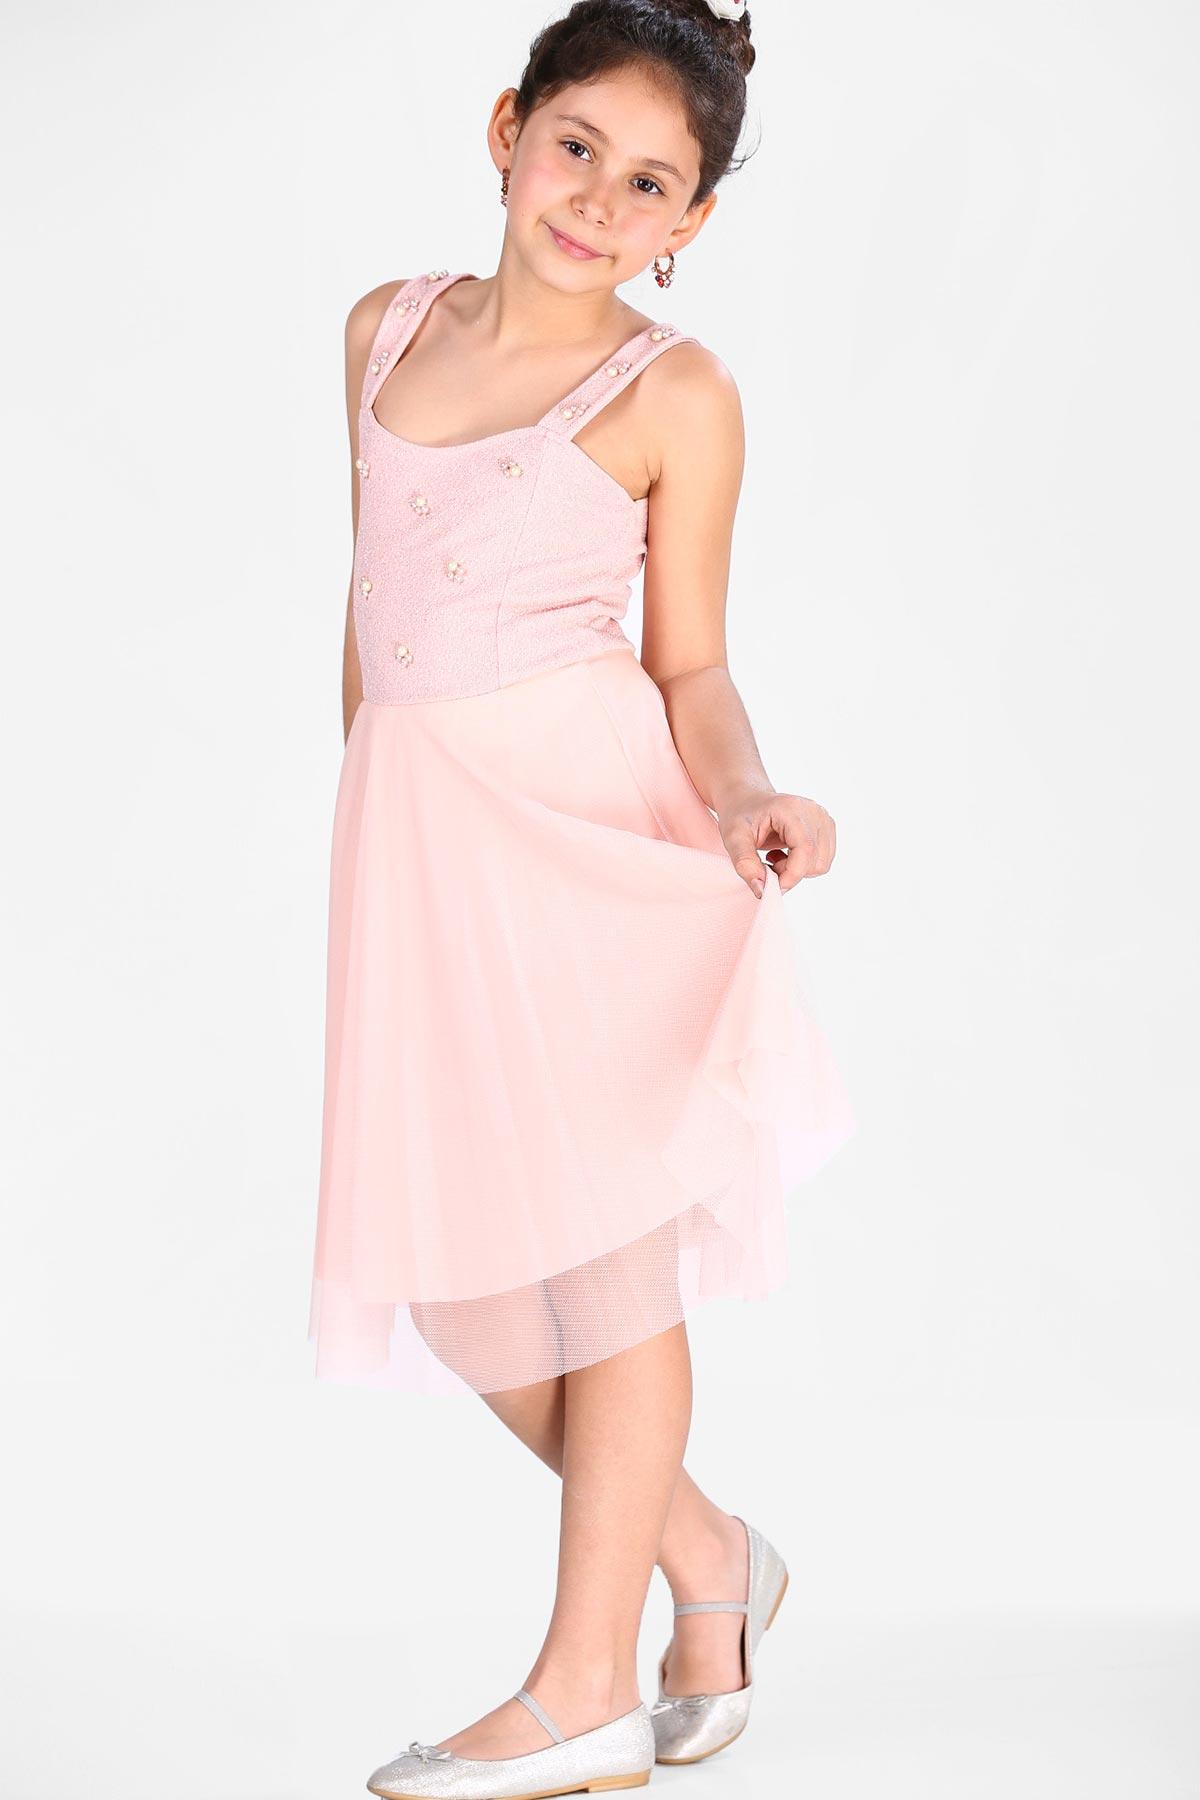 Kid's Pearled Powder Rose Dress